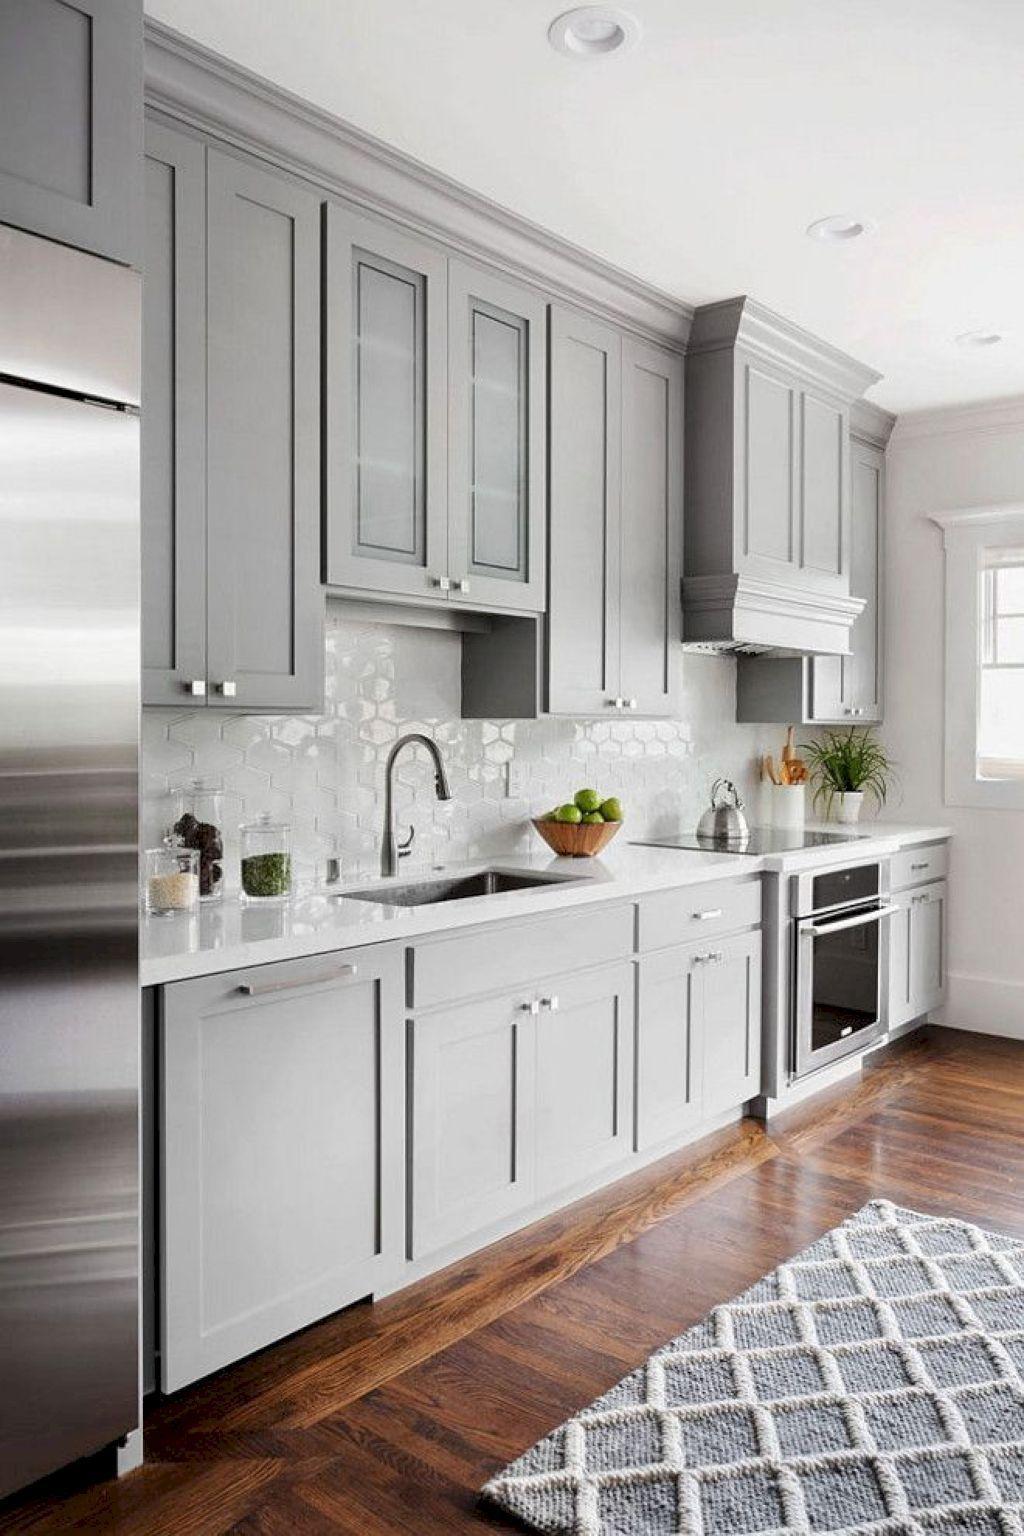 10 Best Farmhouse Kitchen Decor Ideas You Know Needed Shaker